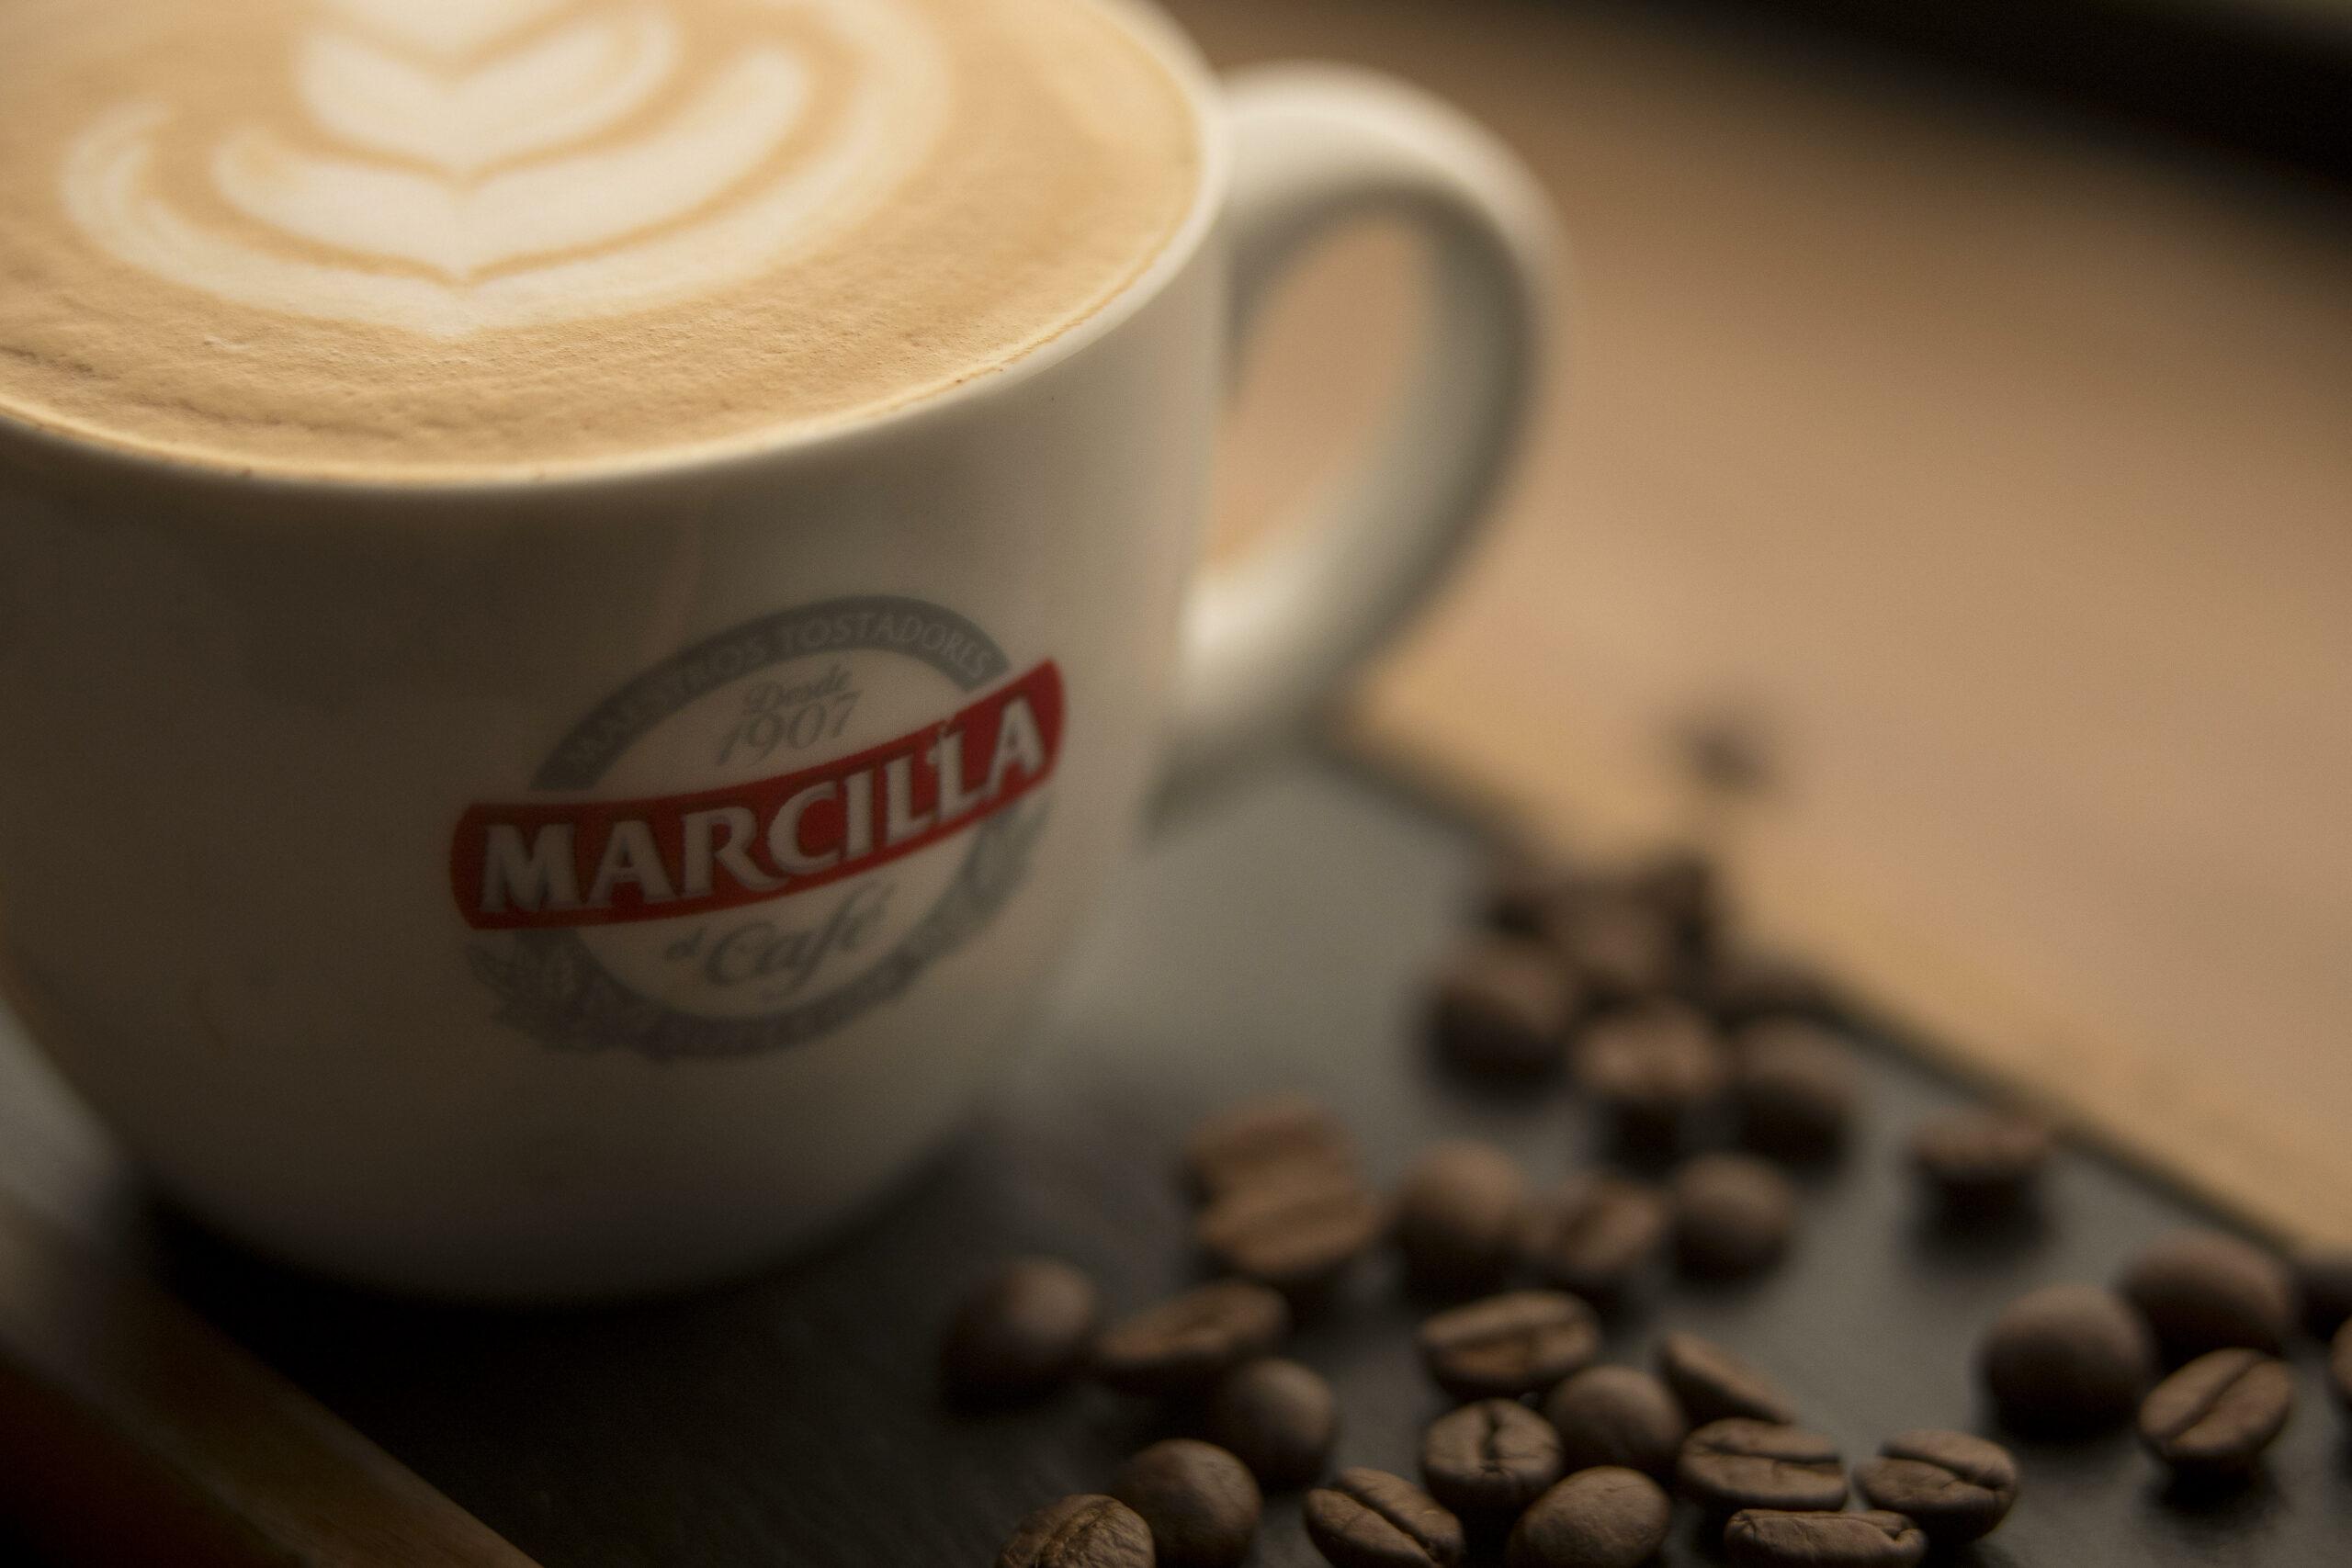 Una tassa de cafè Marcilla   Cedida